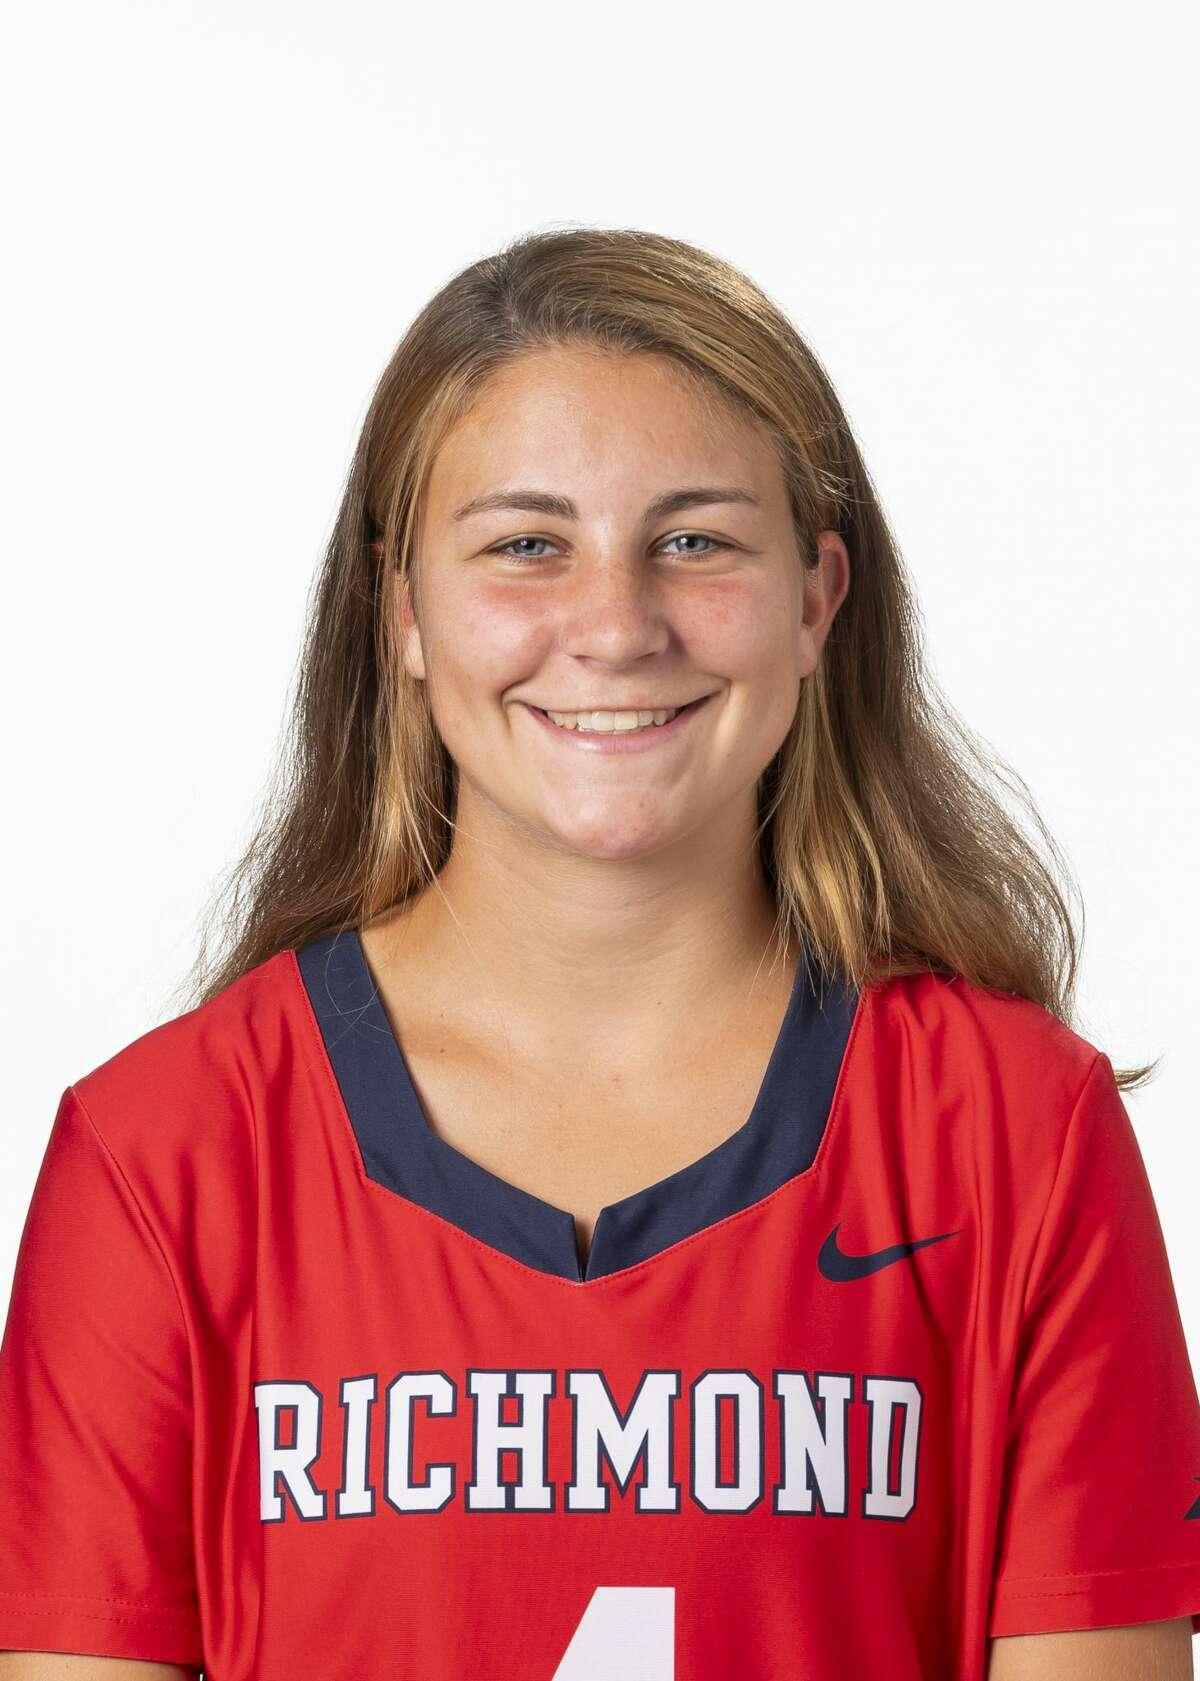 Saratoga Springs High School graduate Lindsey Frank of the Richmond lacrosse team. (Courtesy of Richmond Athletics)